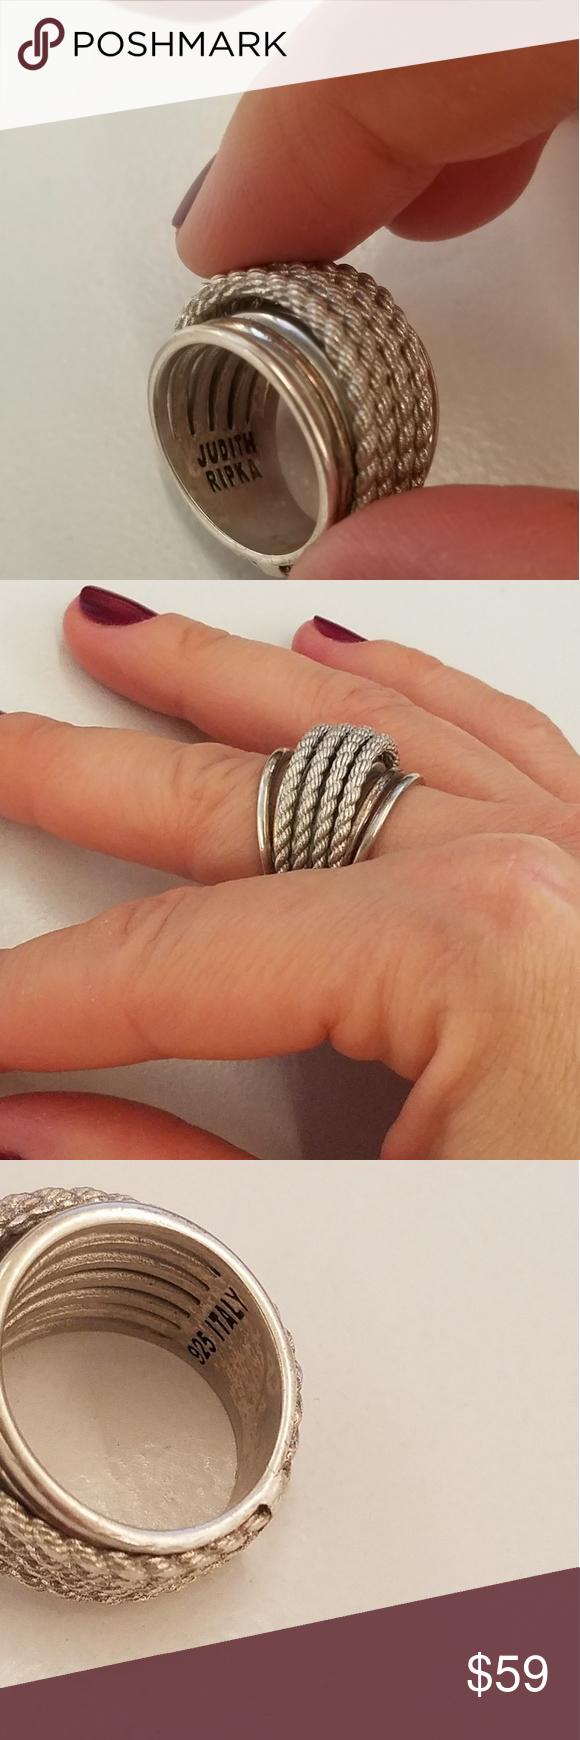 17++ Where is judith ripka jewelry made ideas